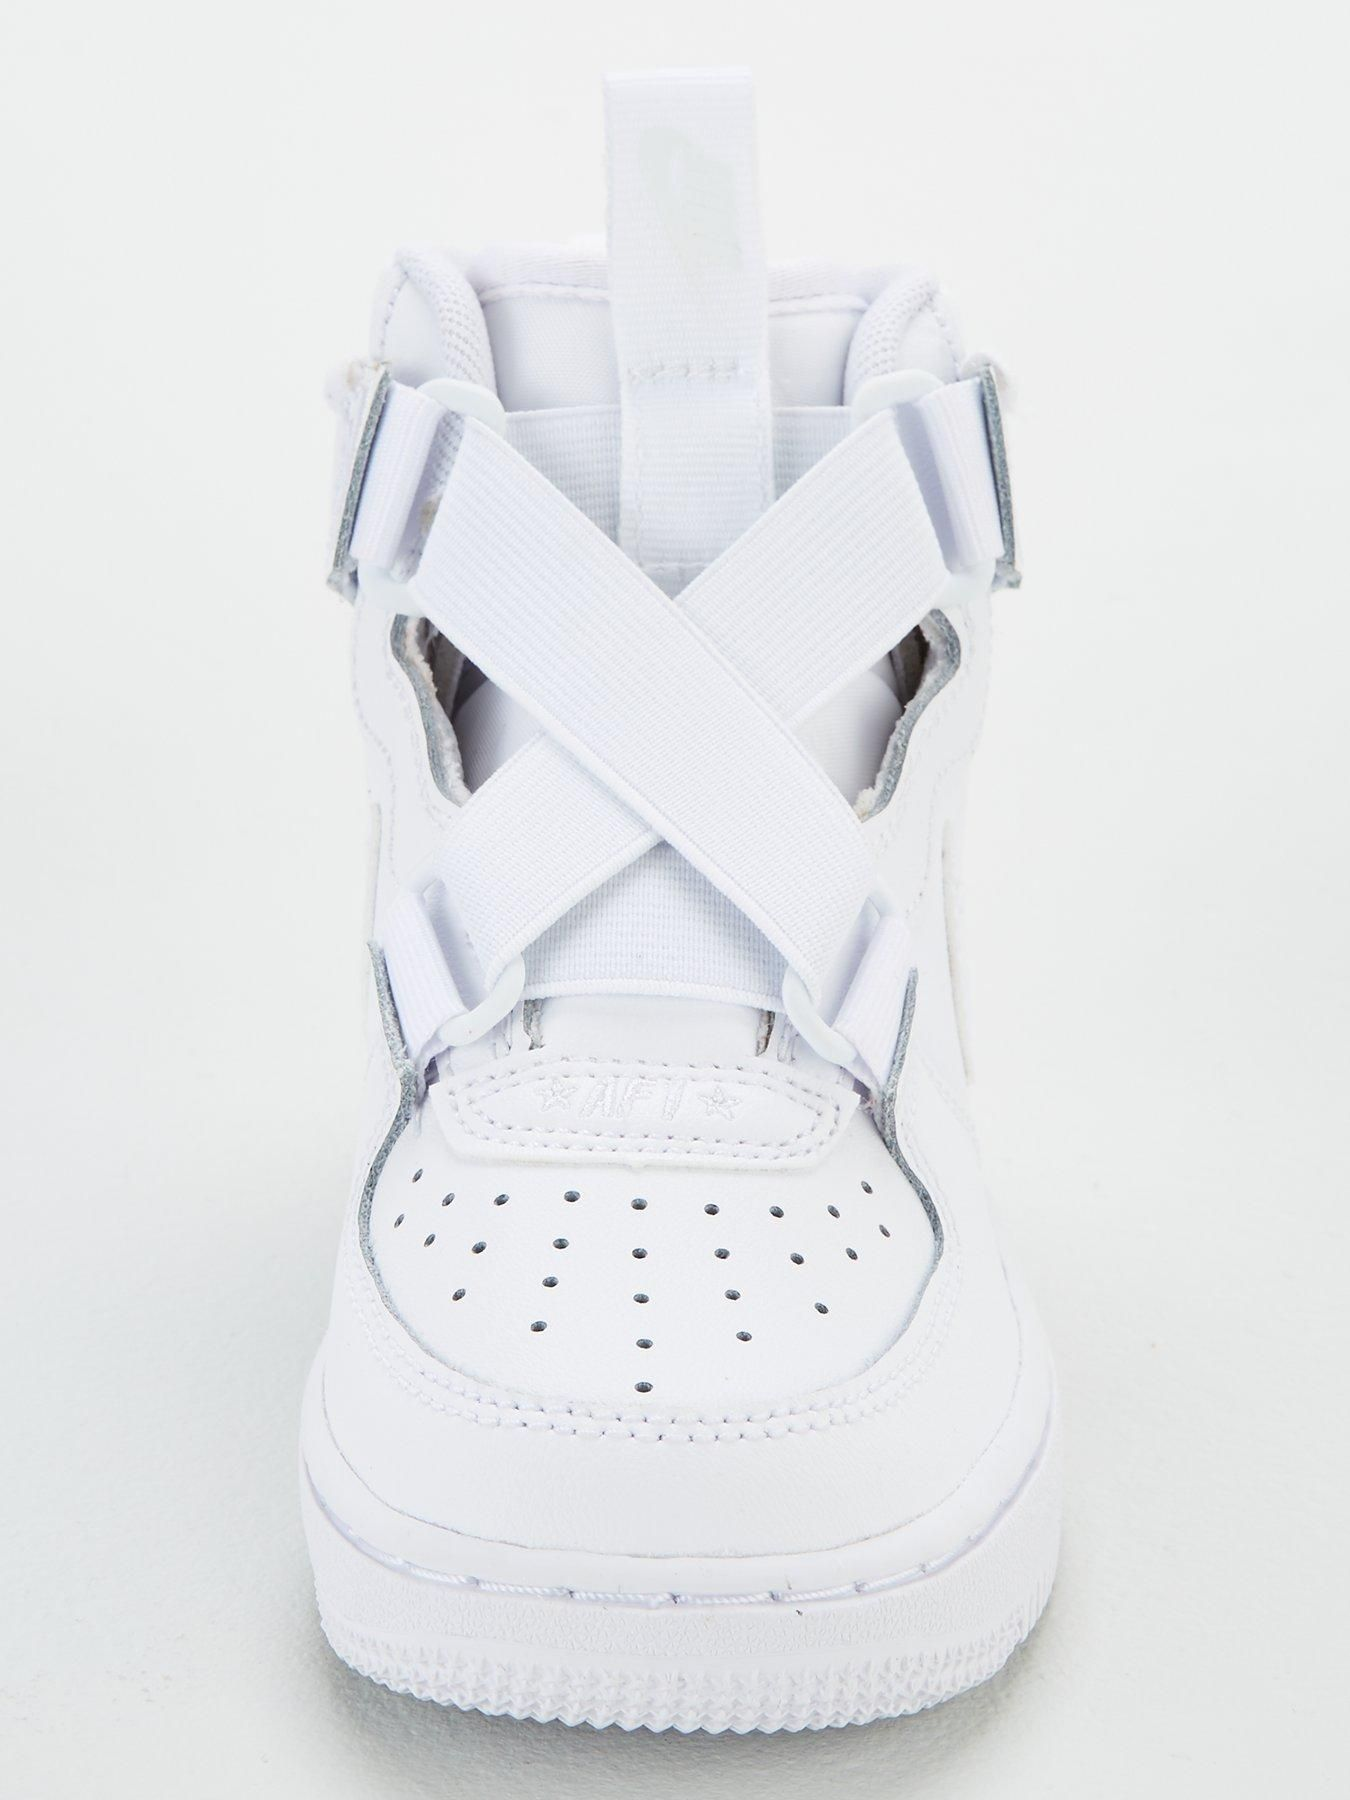 Nike Air Force 1 Highness Childrens Trainer White White